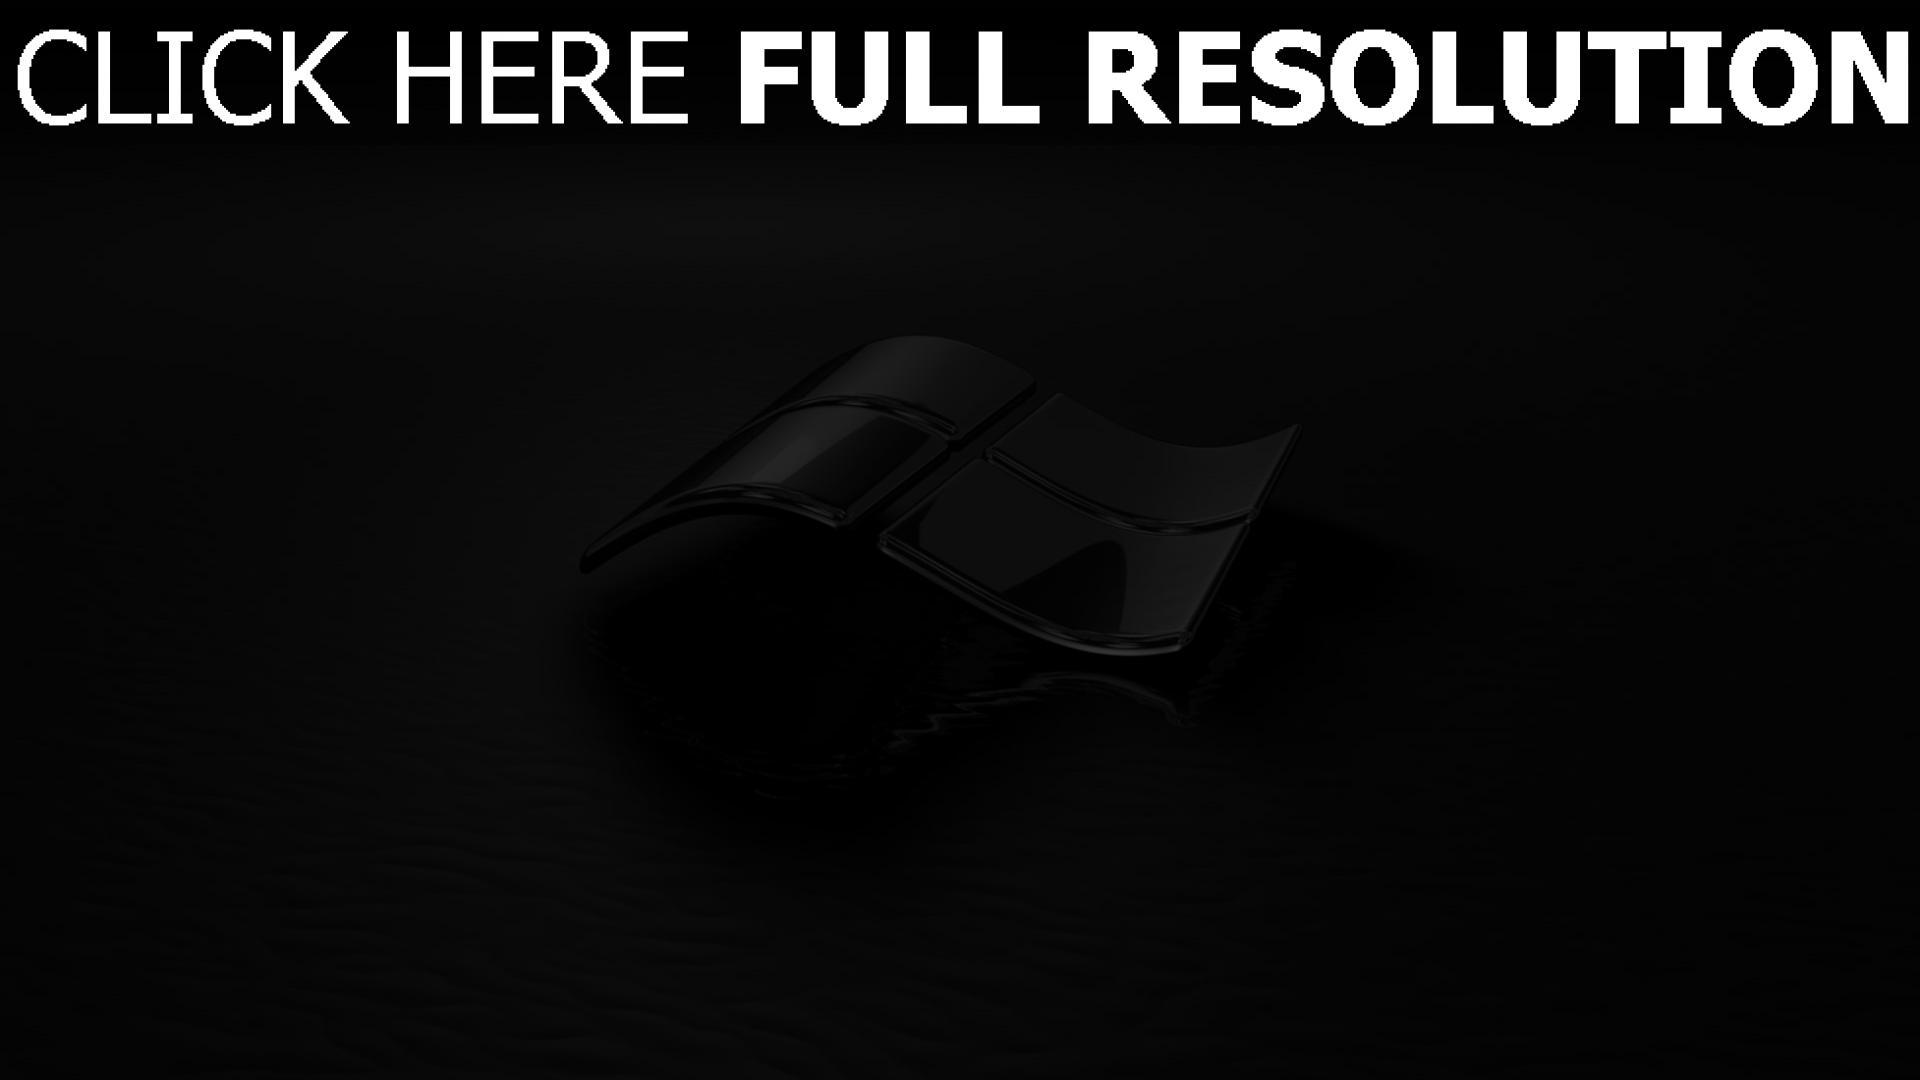 hd hintergrundbilder windows emblem logo 3d schwarz 1920x1080